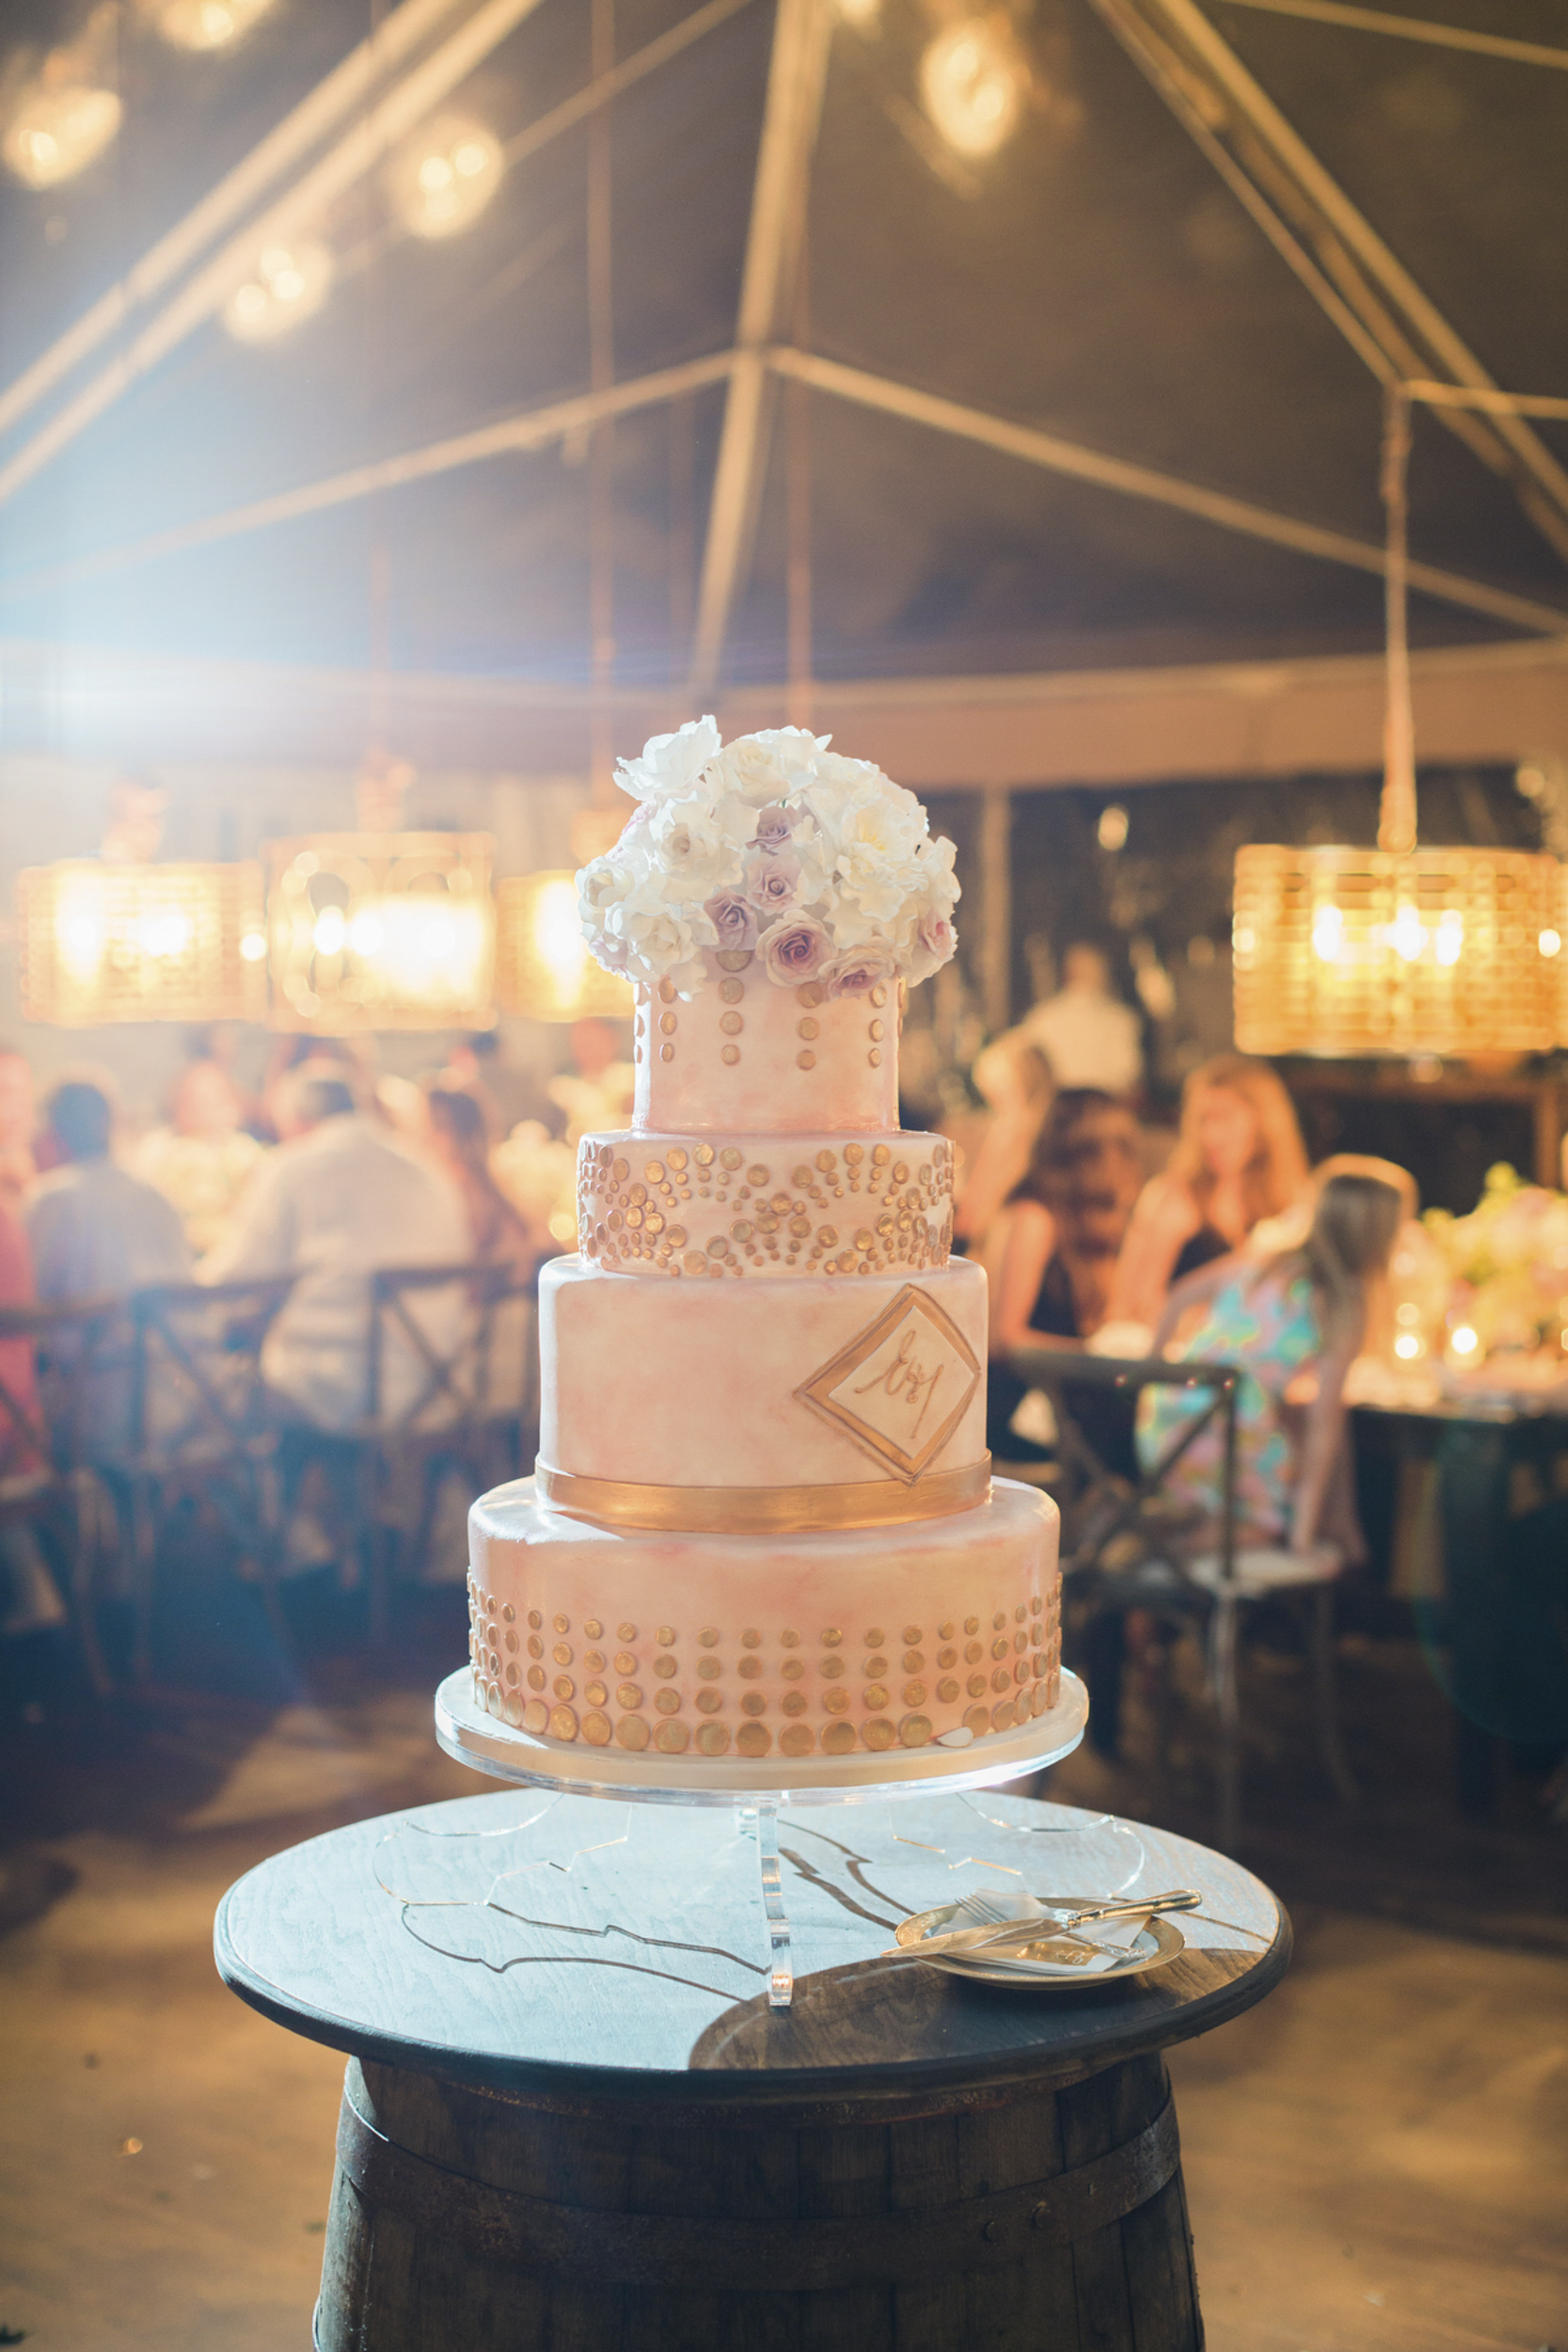 south_carolina_farm_wedding_rustic_chic_surprise_secret_luxe_wedding_bachelorette_emily_maynard_real_weddings-49.jpg